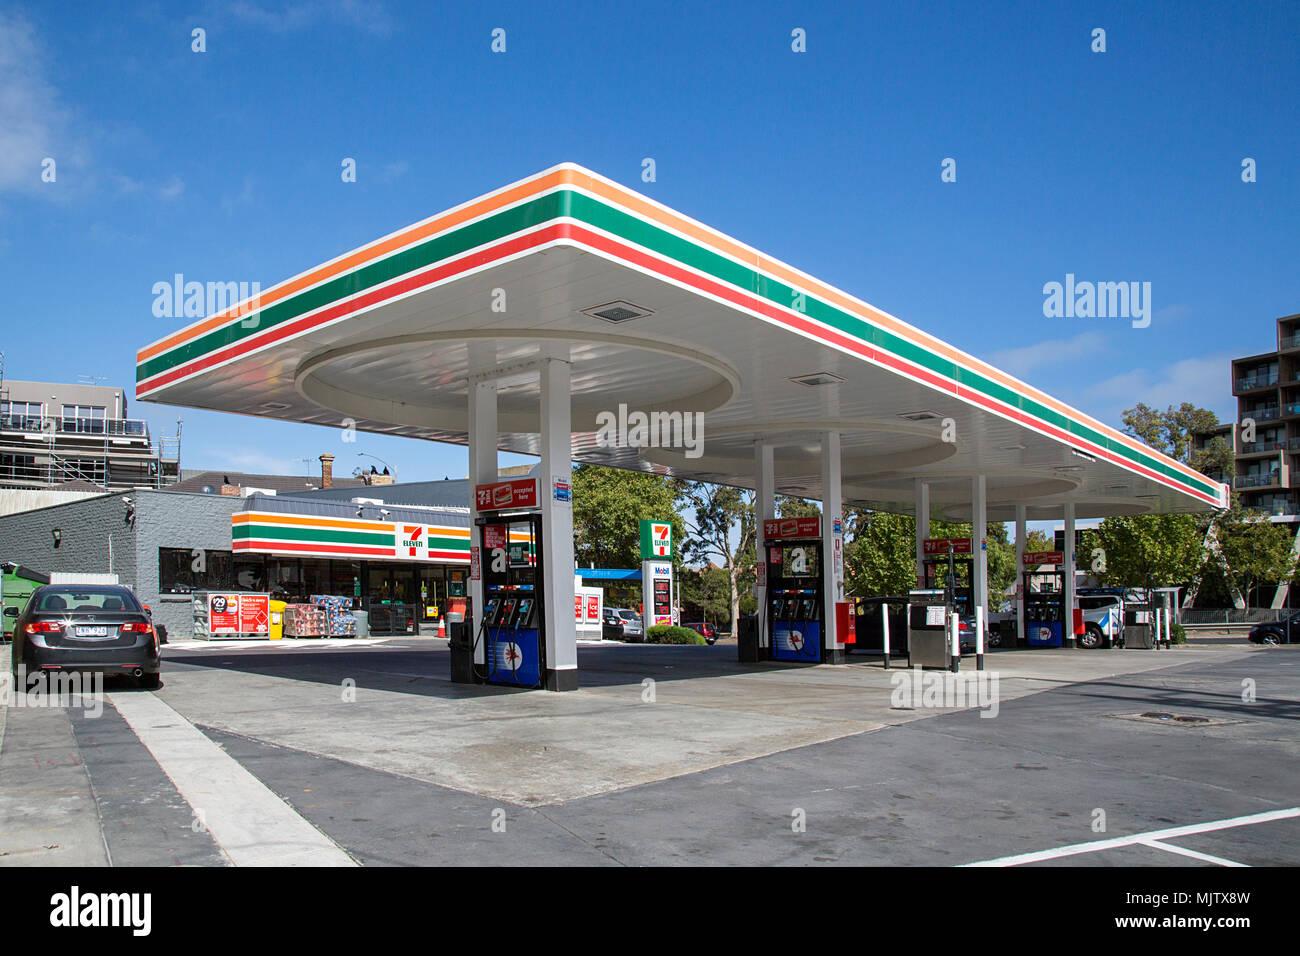 Convenience stores stock photos convenience stores stock for Mobili convenienti